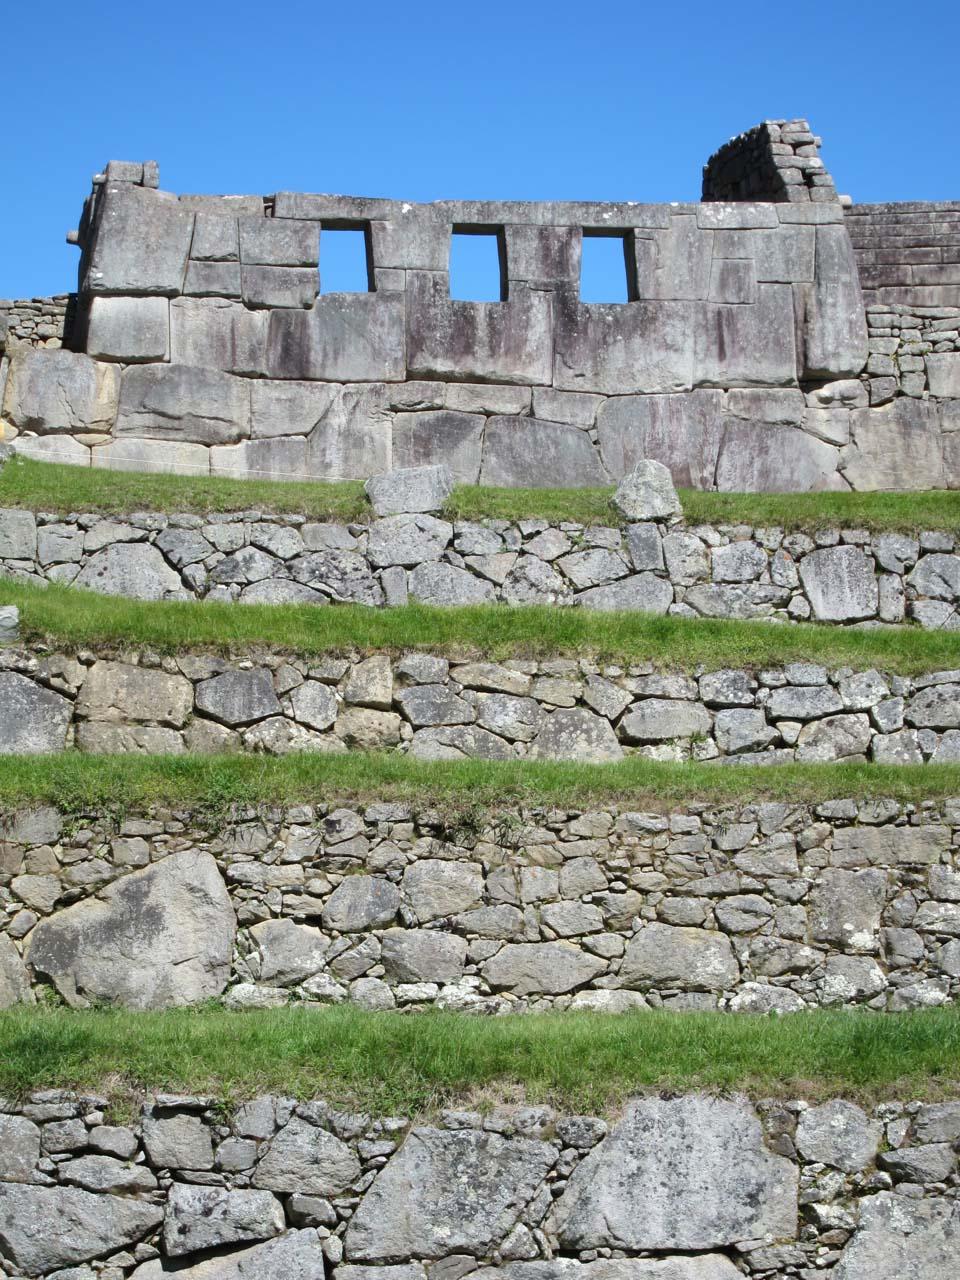 Temple of the Three Windows, Machu Picchu